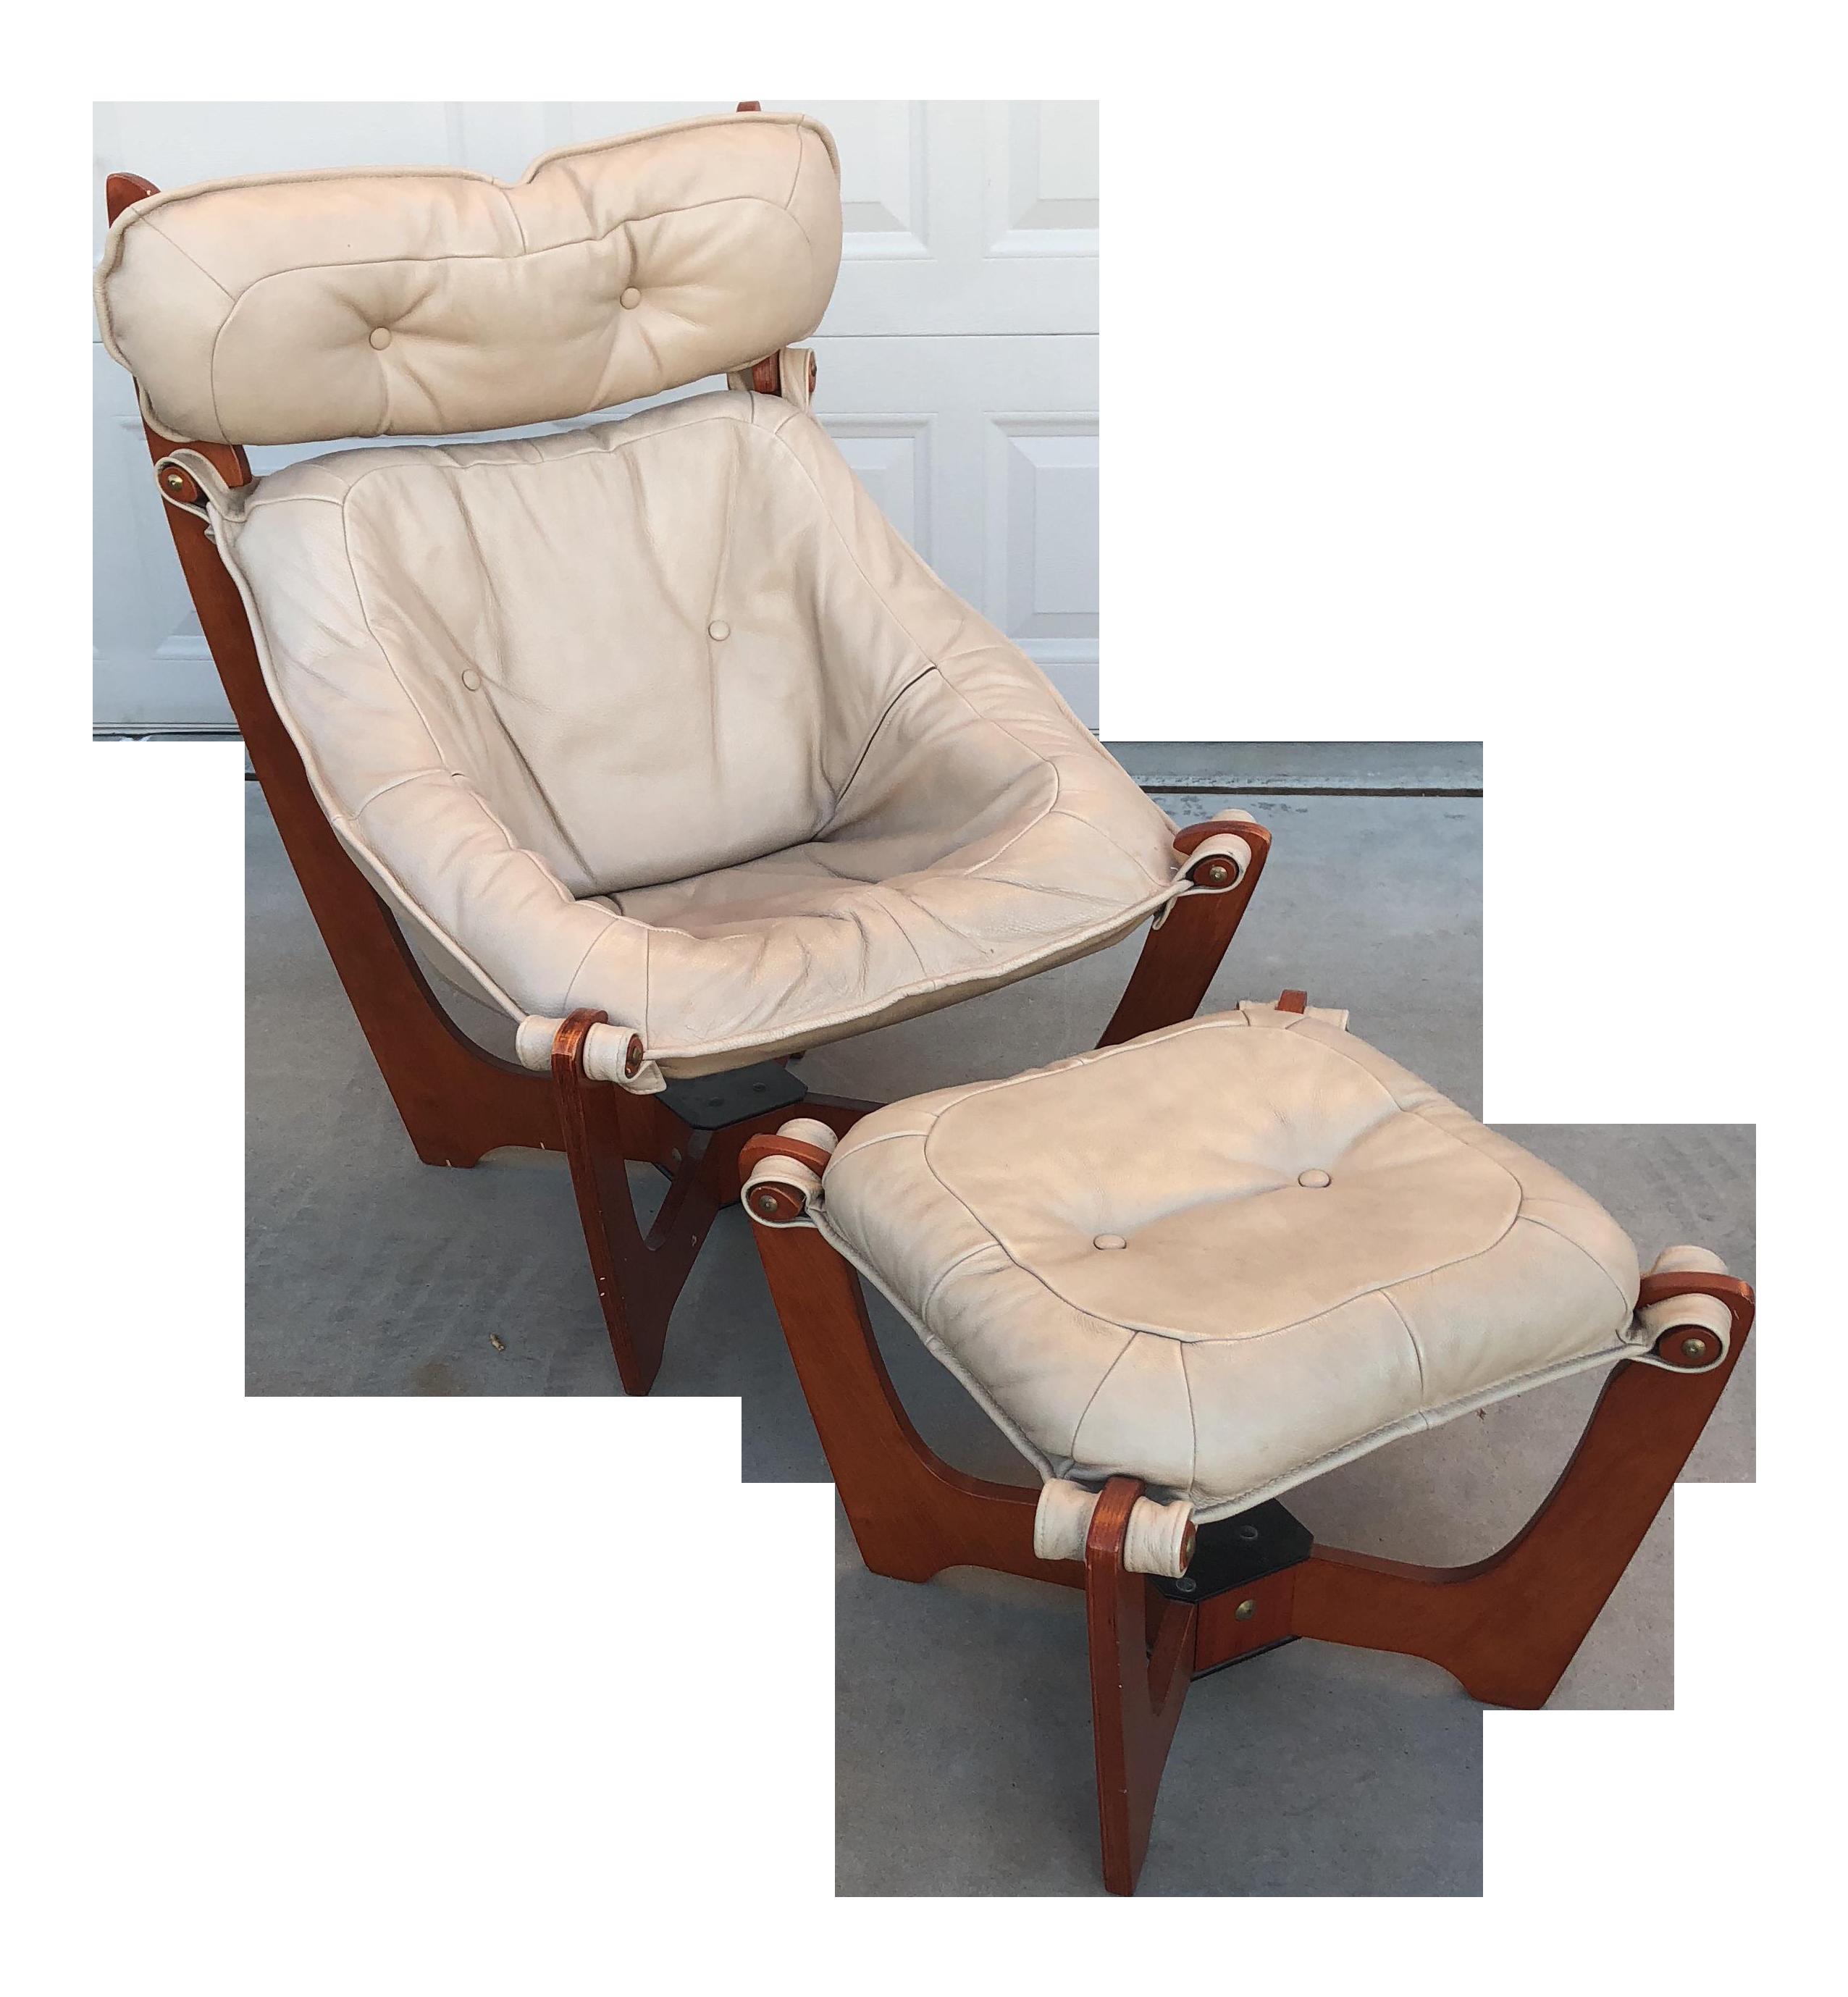 Awe Inspiring Luna Leather Sling Chair With Ottoman A Pair Spiritservingveterans Wood Chair Design Ideas Spiritservingveteransorg